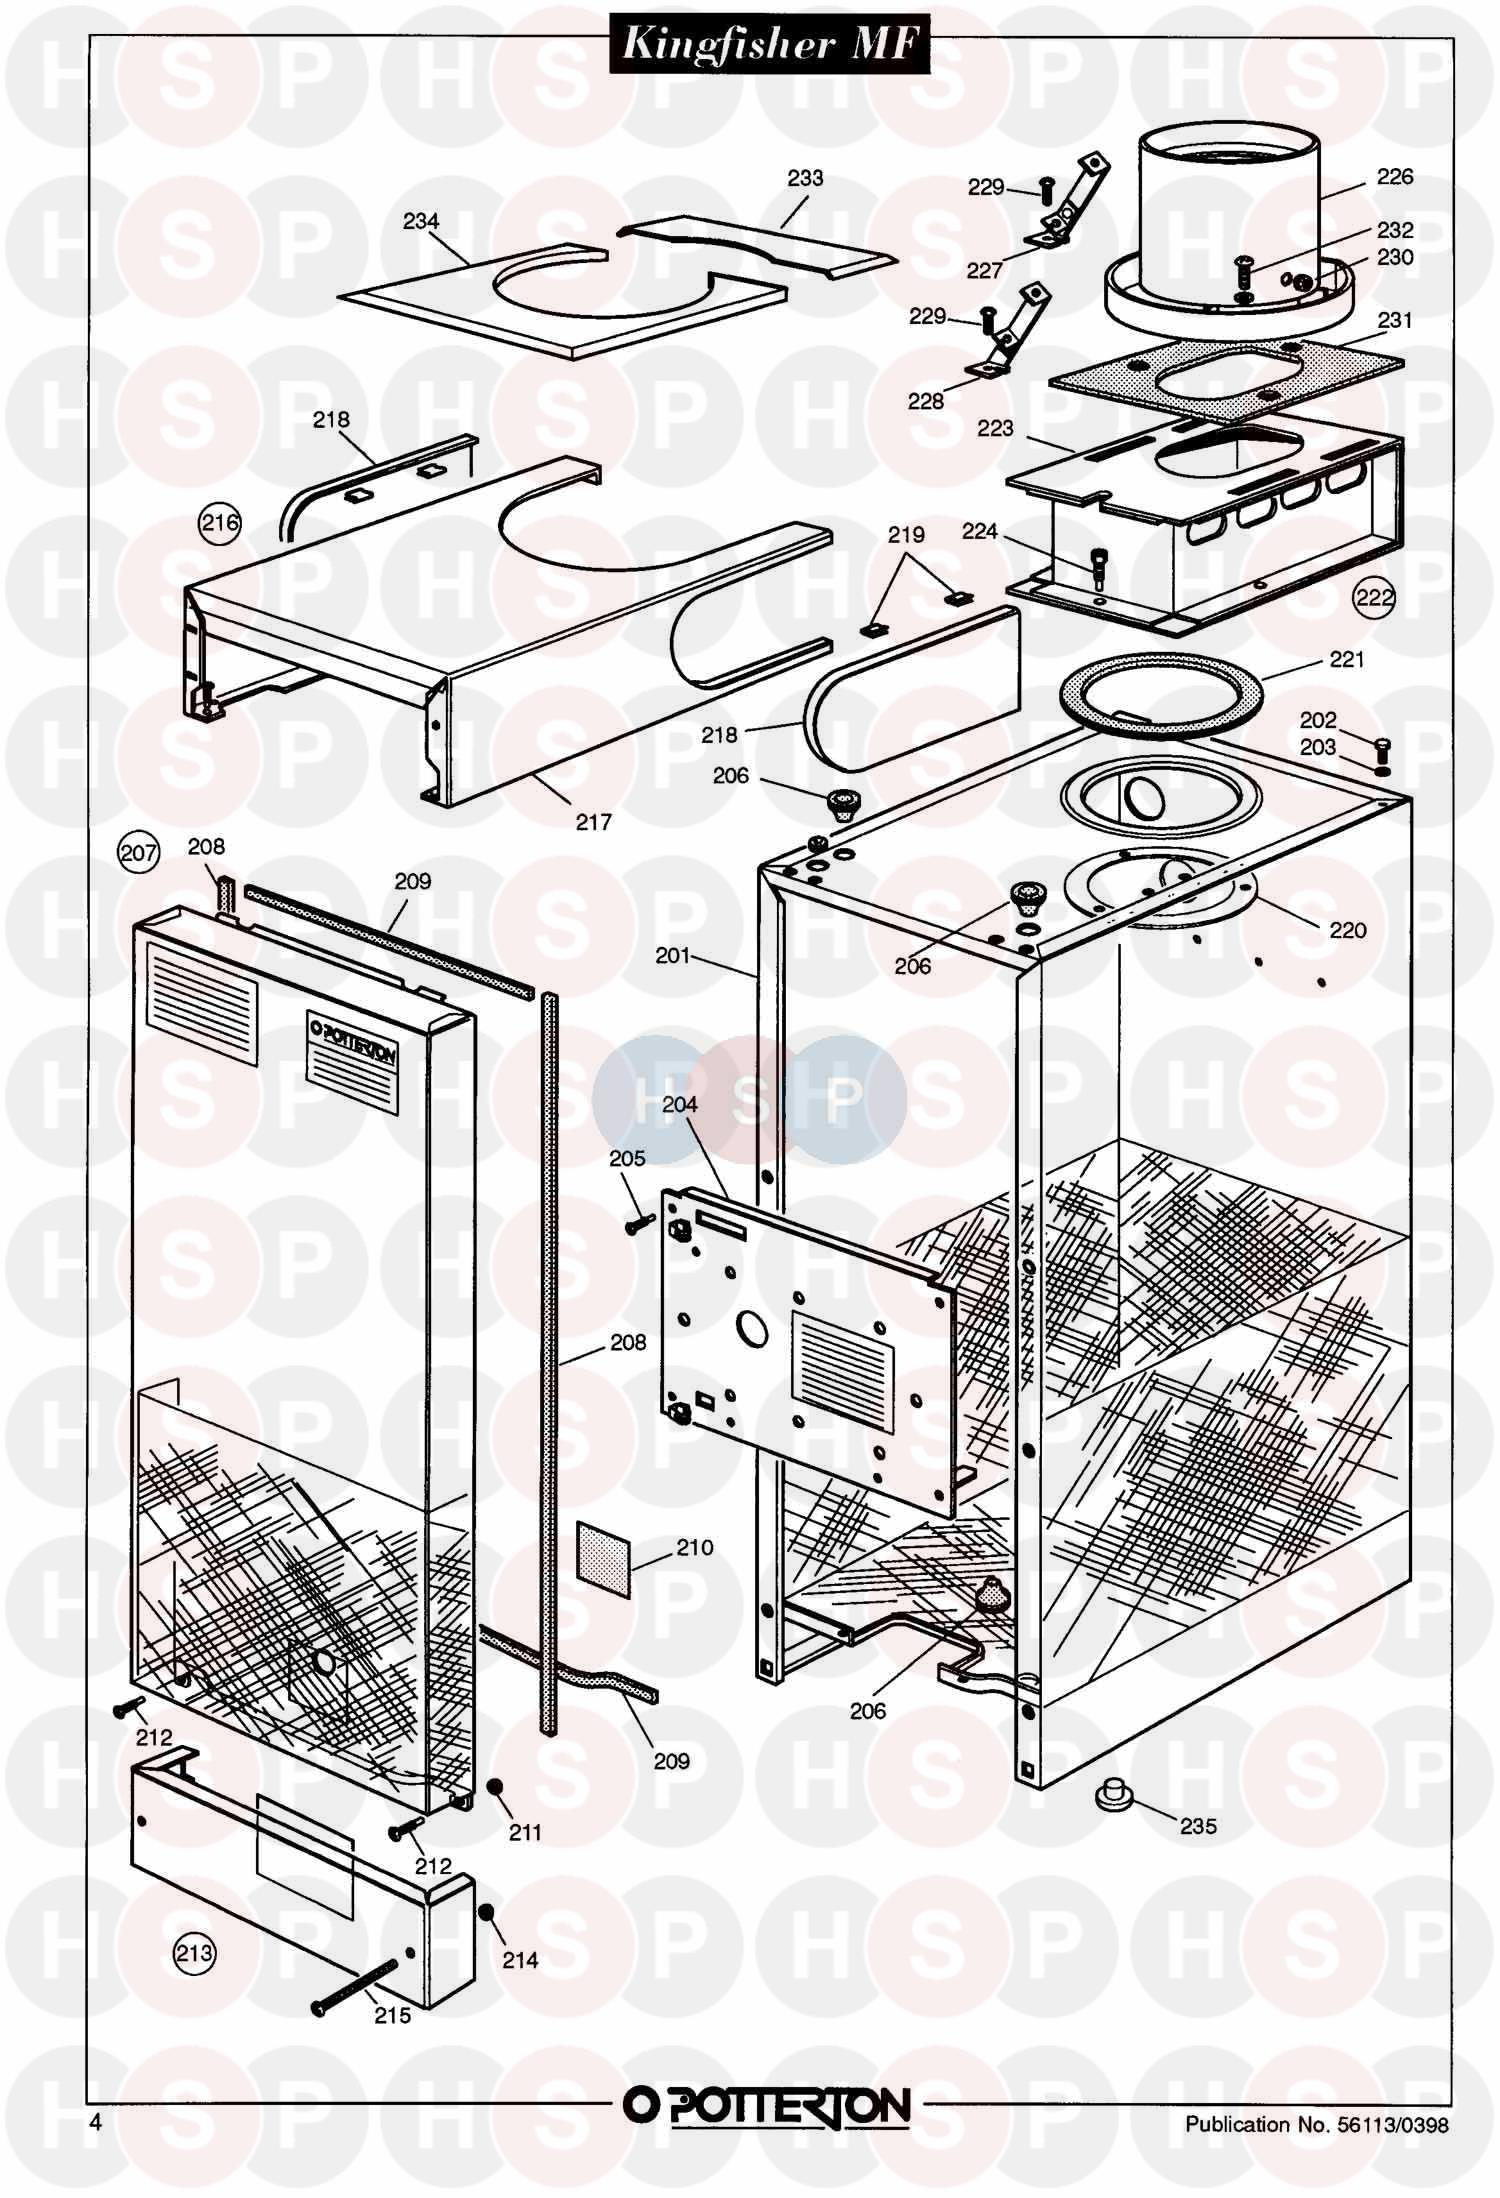 Potterton KINGFISHER MF CF80 Appliance Diagram (ASSEMBLY 1